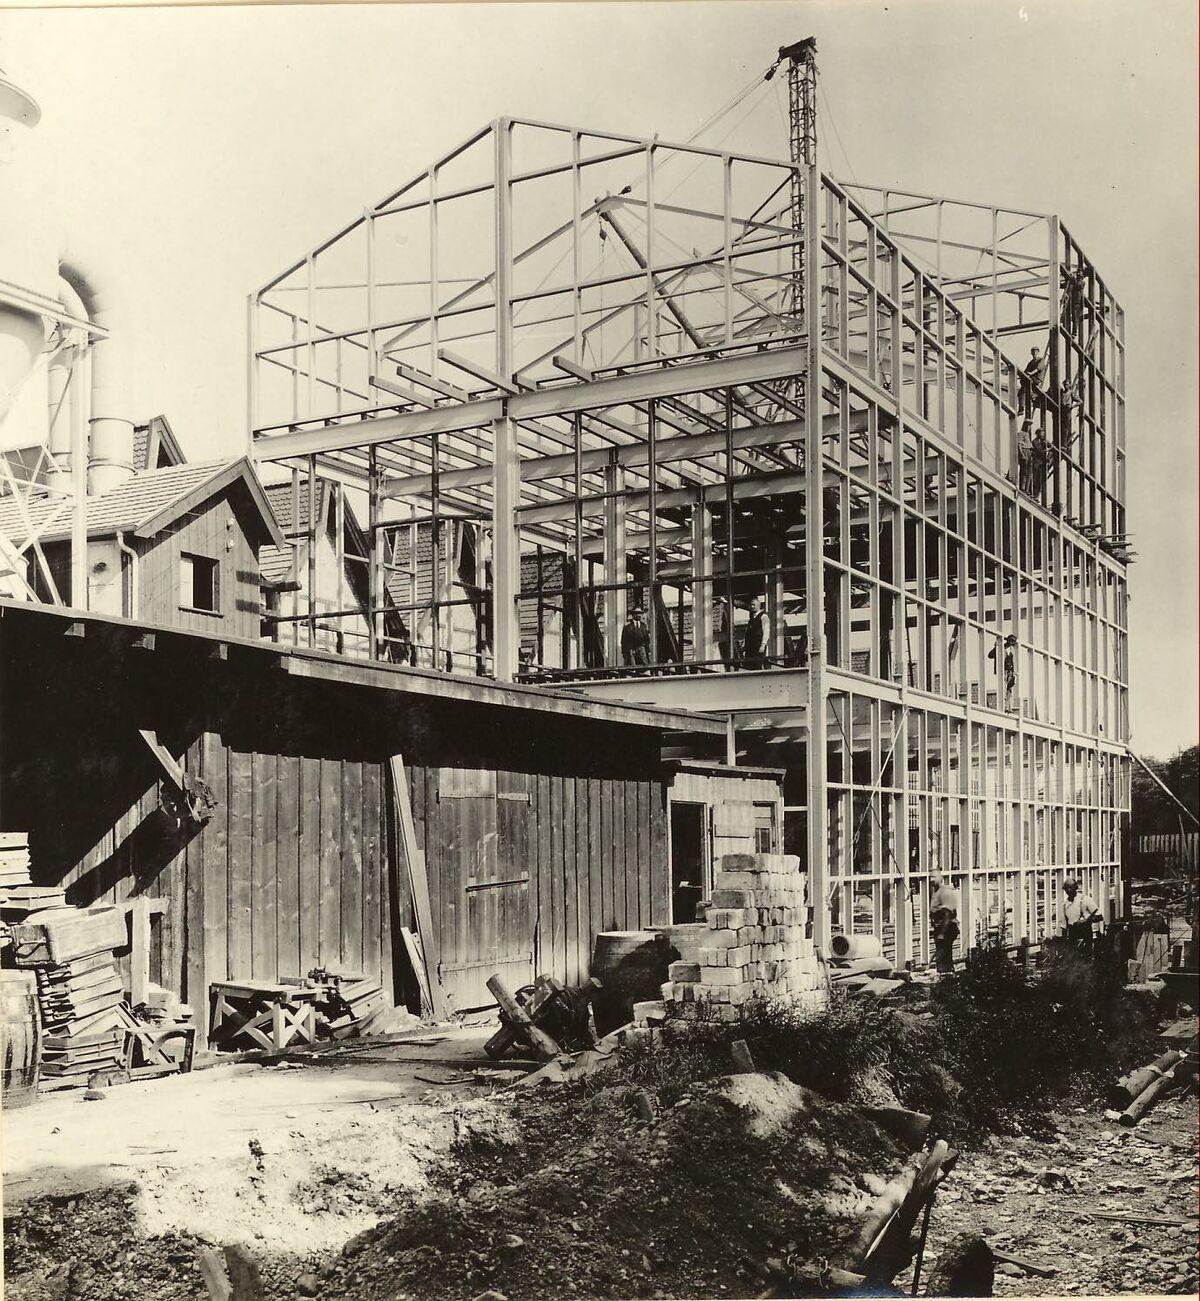 GFA 24/53.1120: Reconstruction sand shop